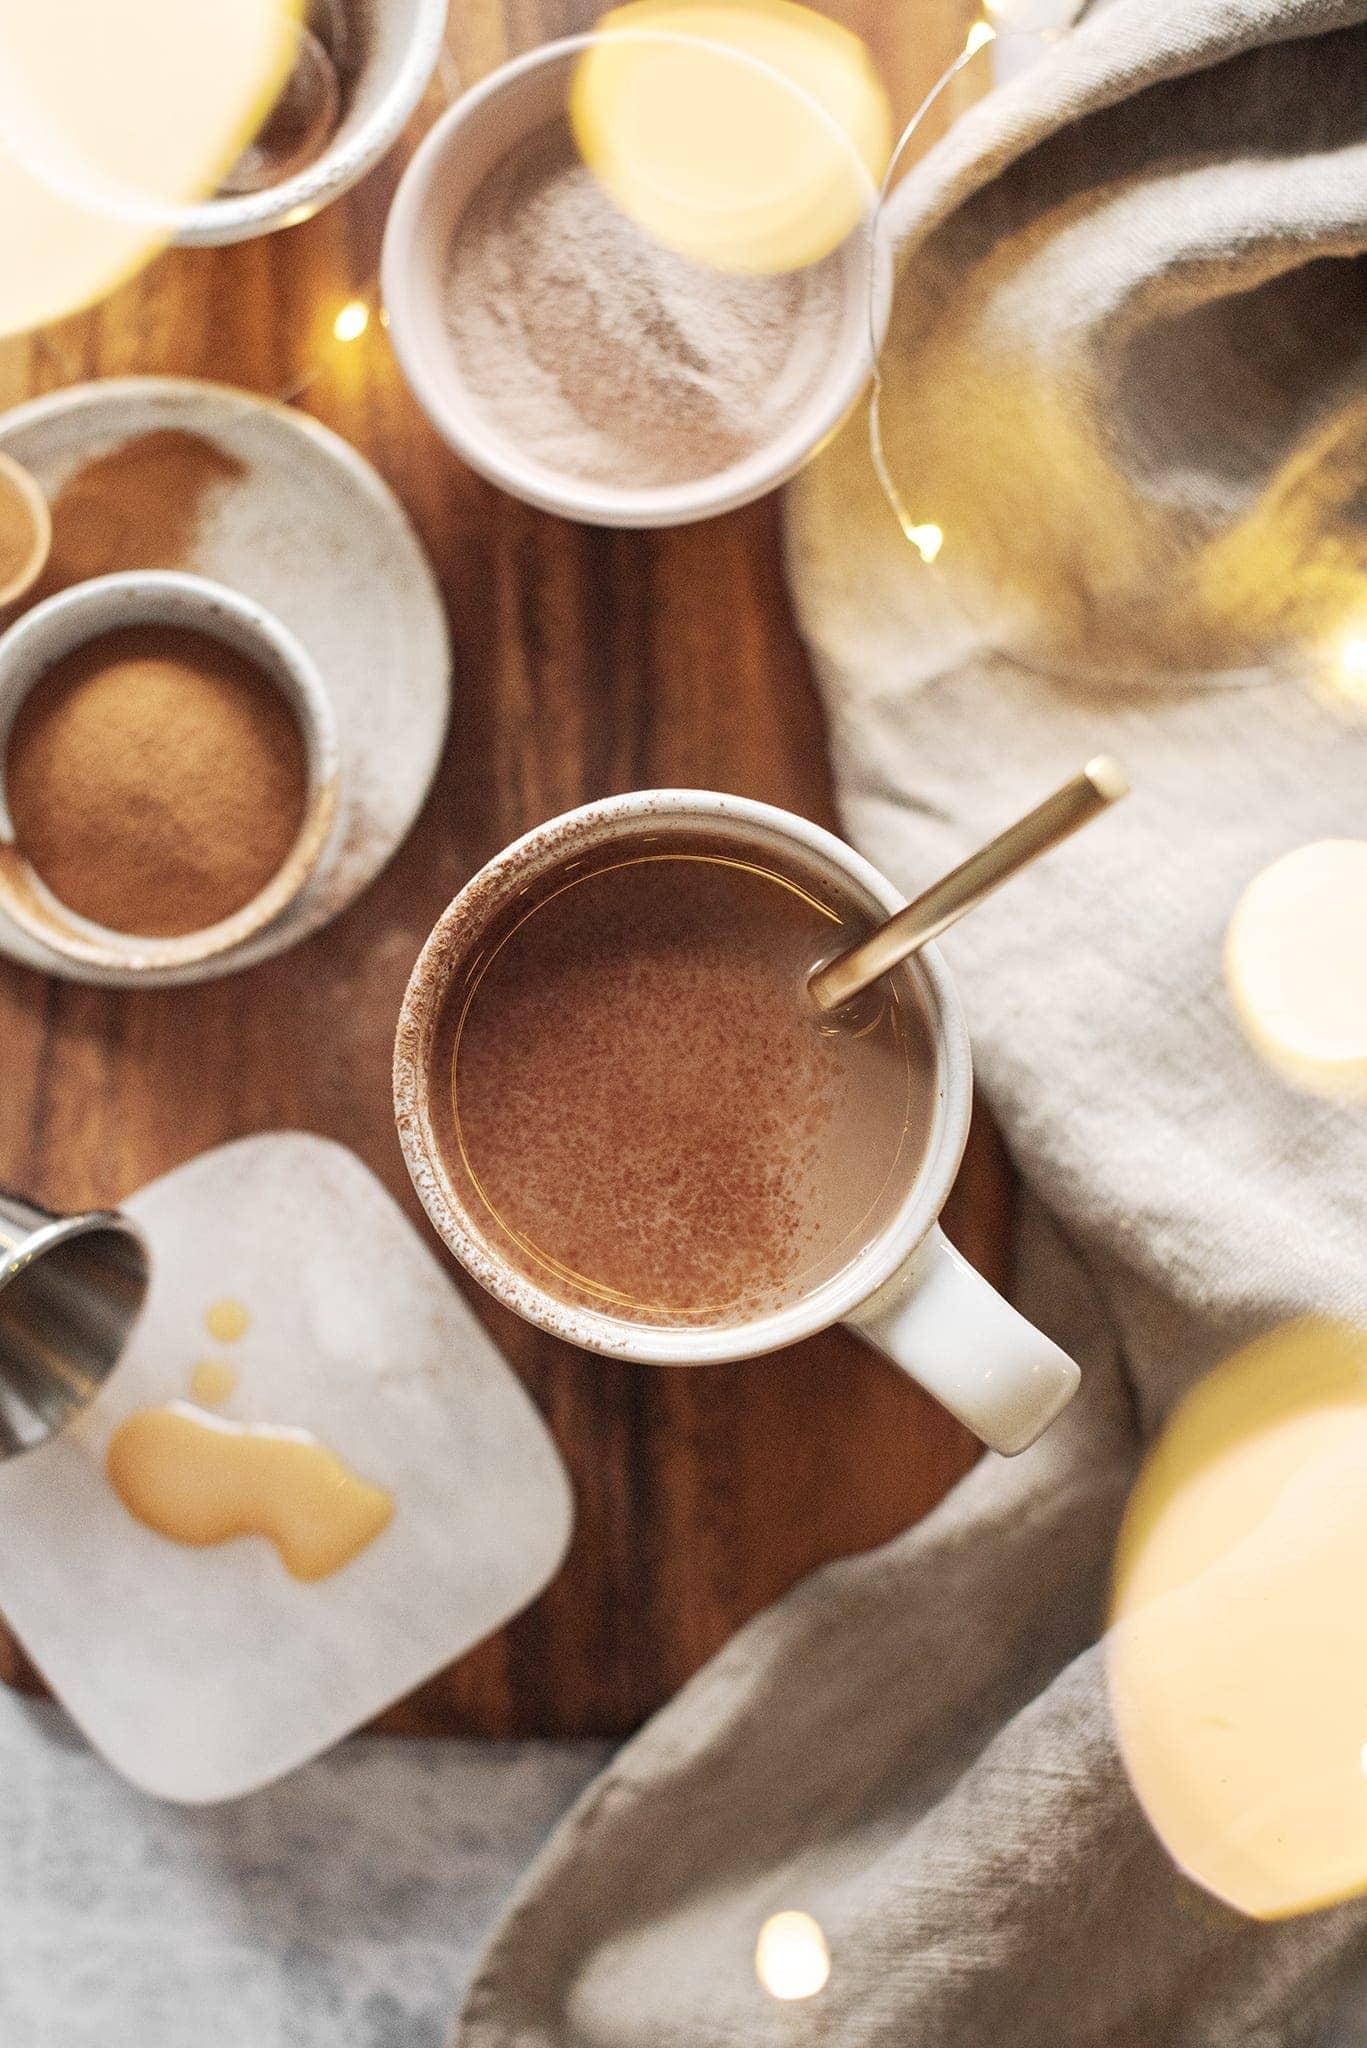 A mug of Amarula caffe mocha on wooden board with twinkle lights